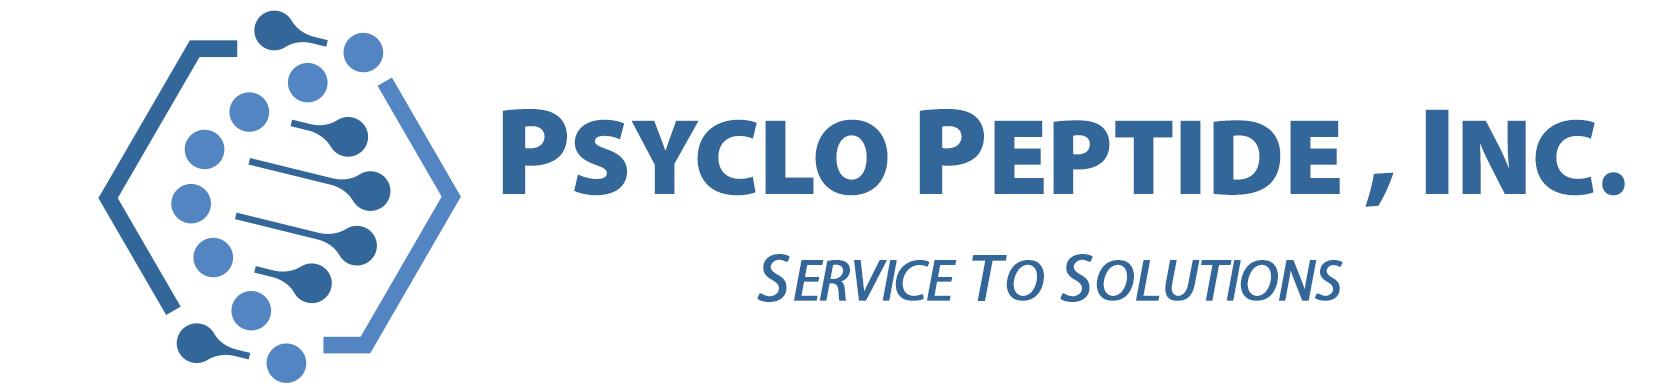 PSYCLO PEPTIDE,INC.